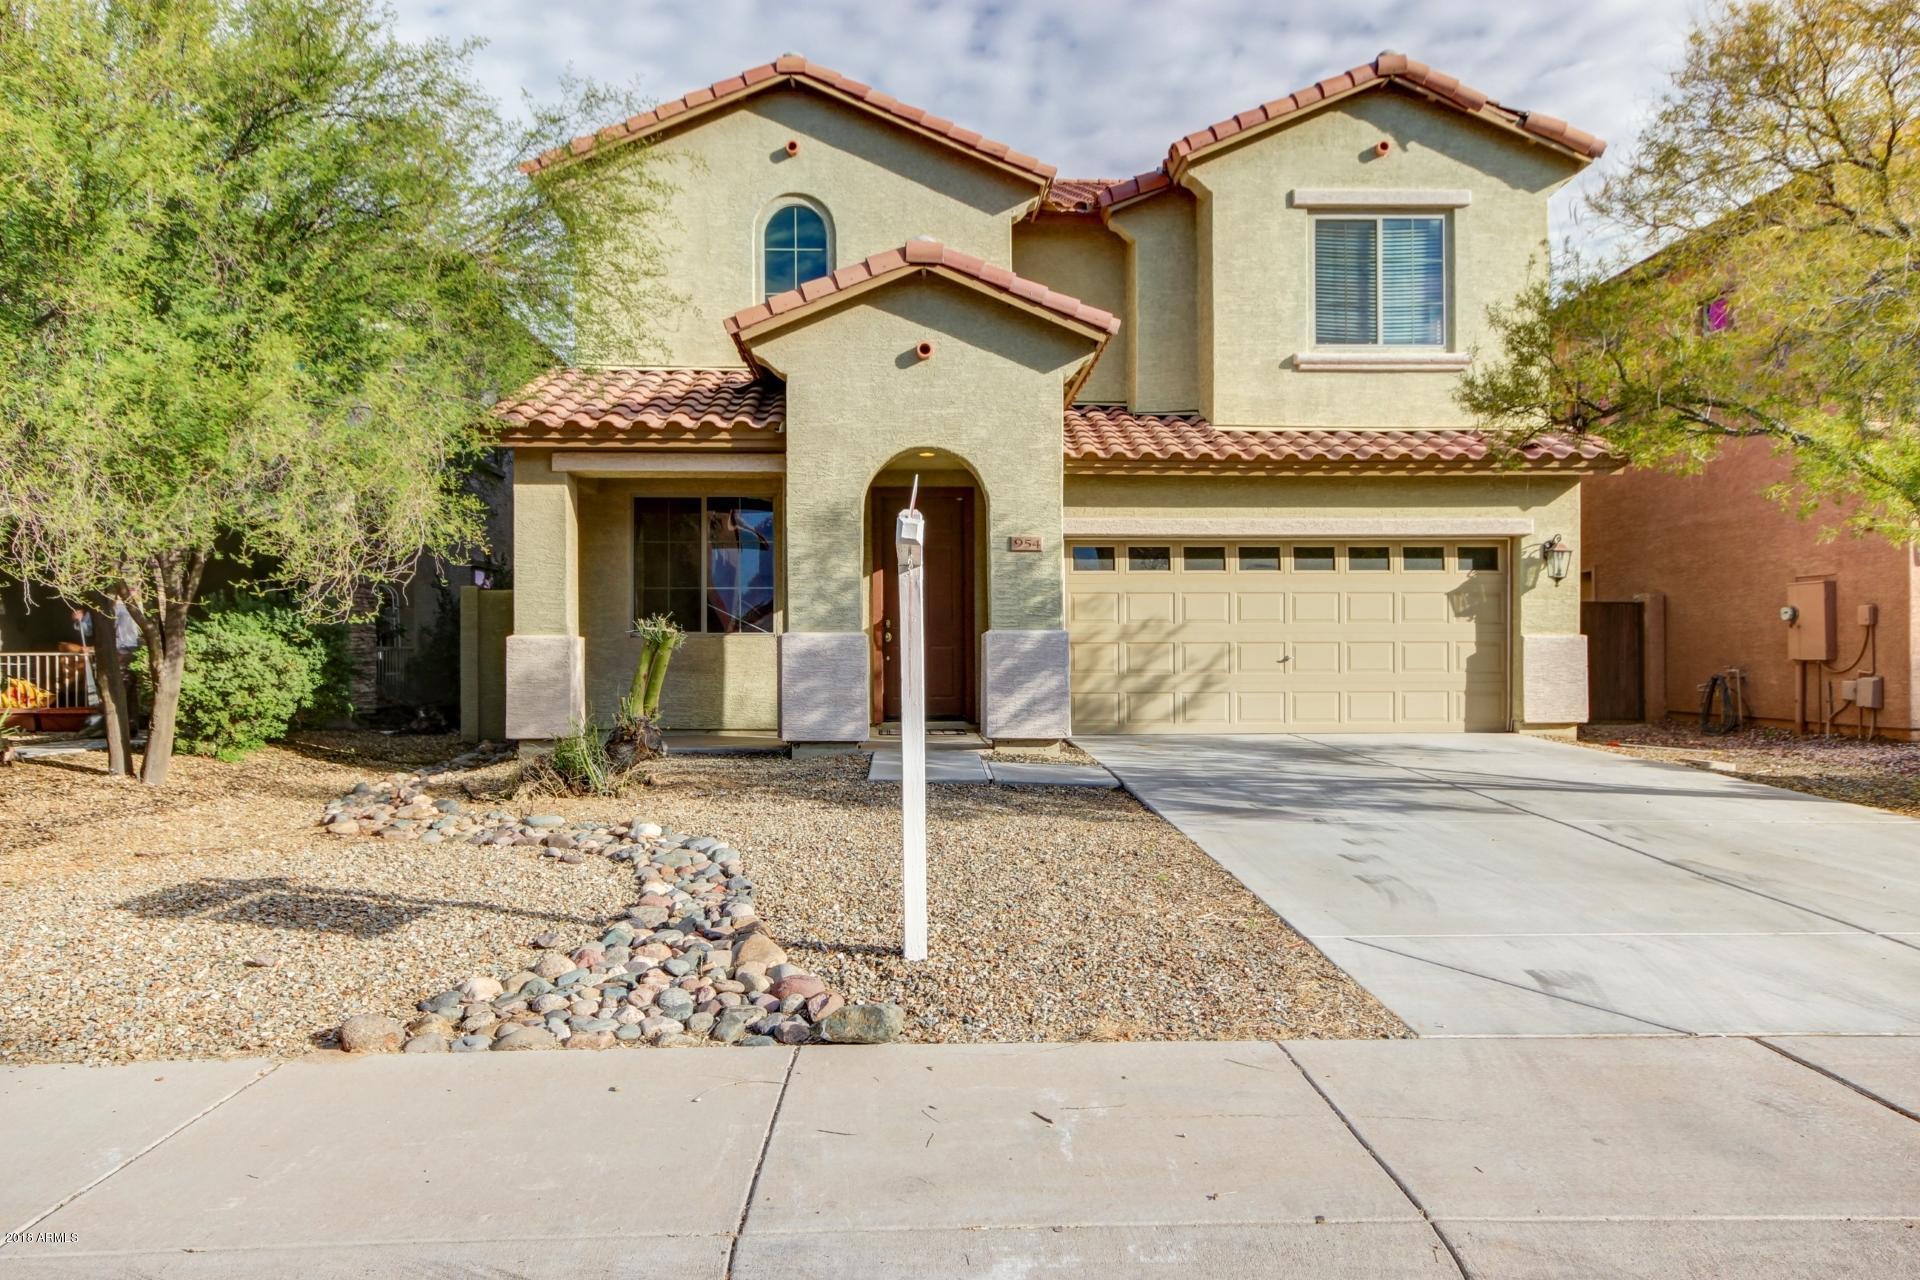 954 E Corrall Street Avondale, AZ 85323 - MLS #: 5853581